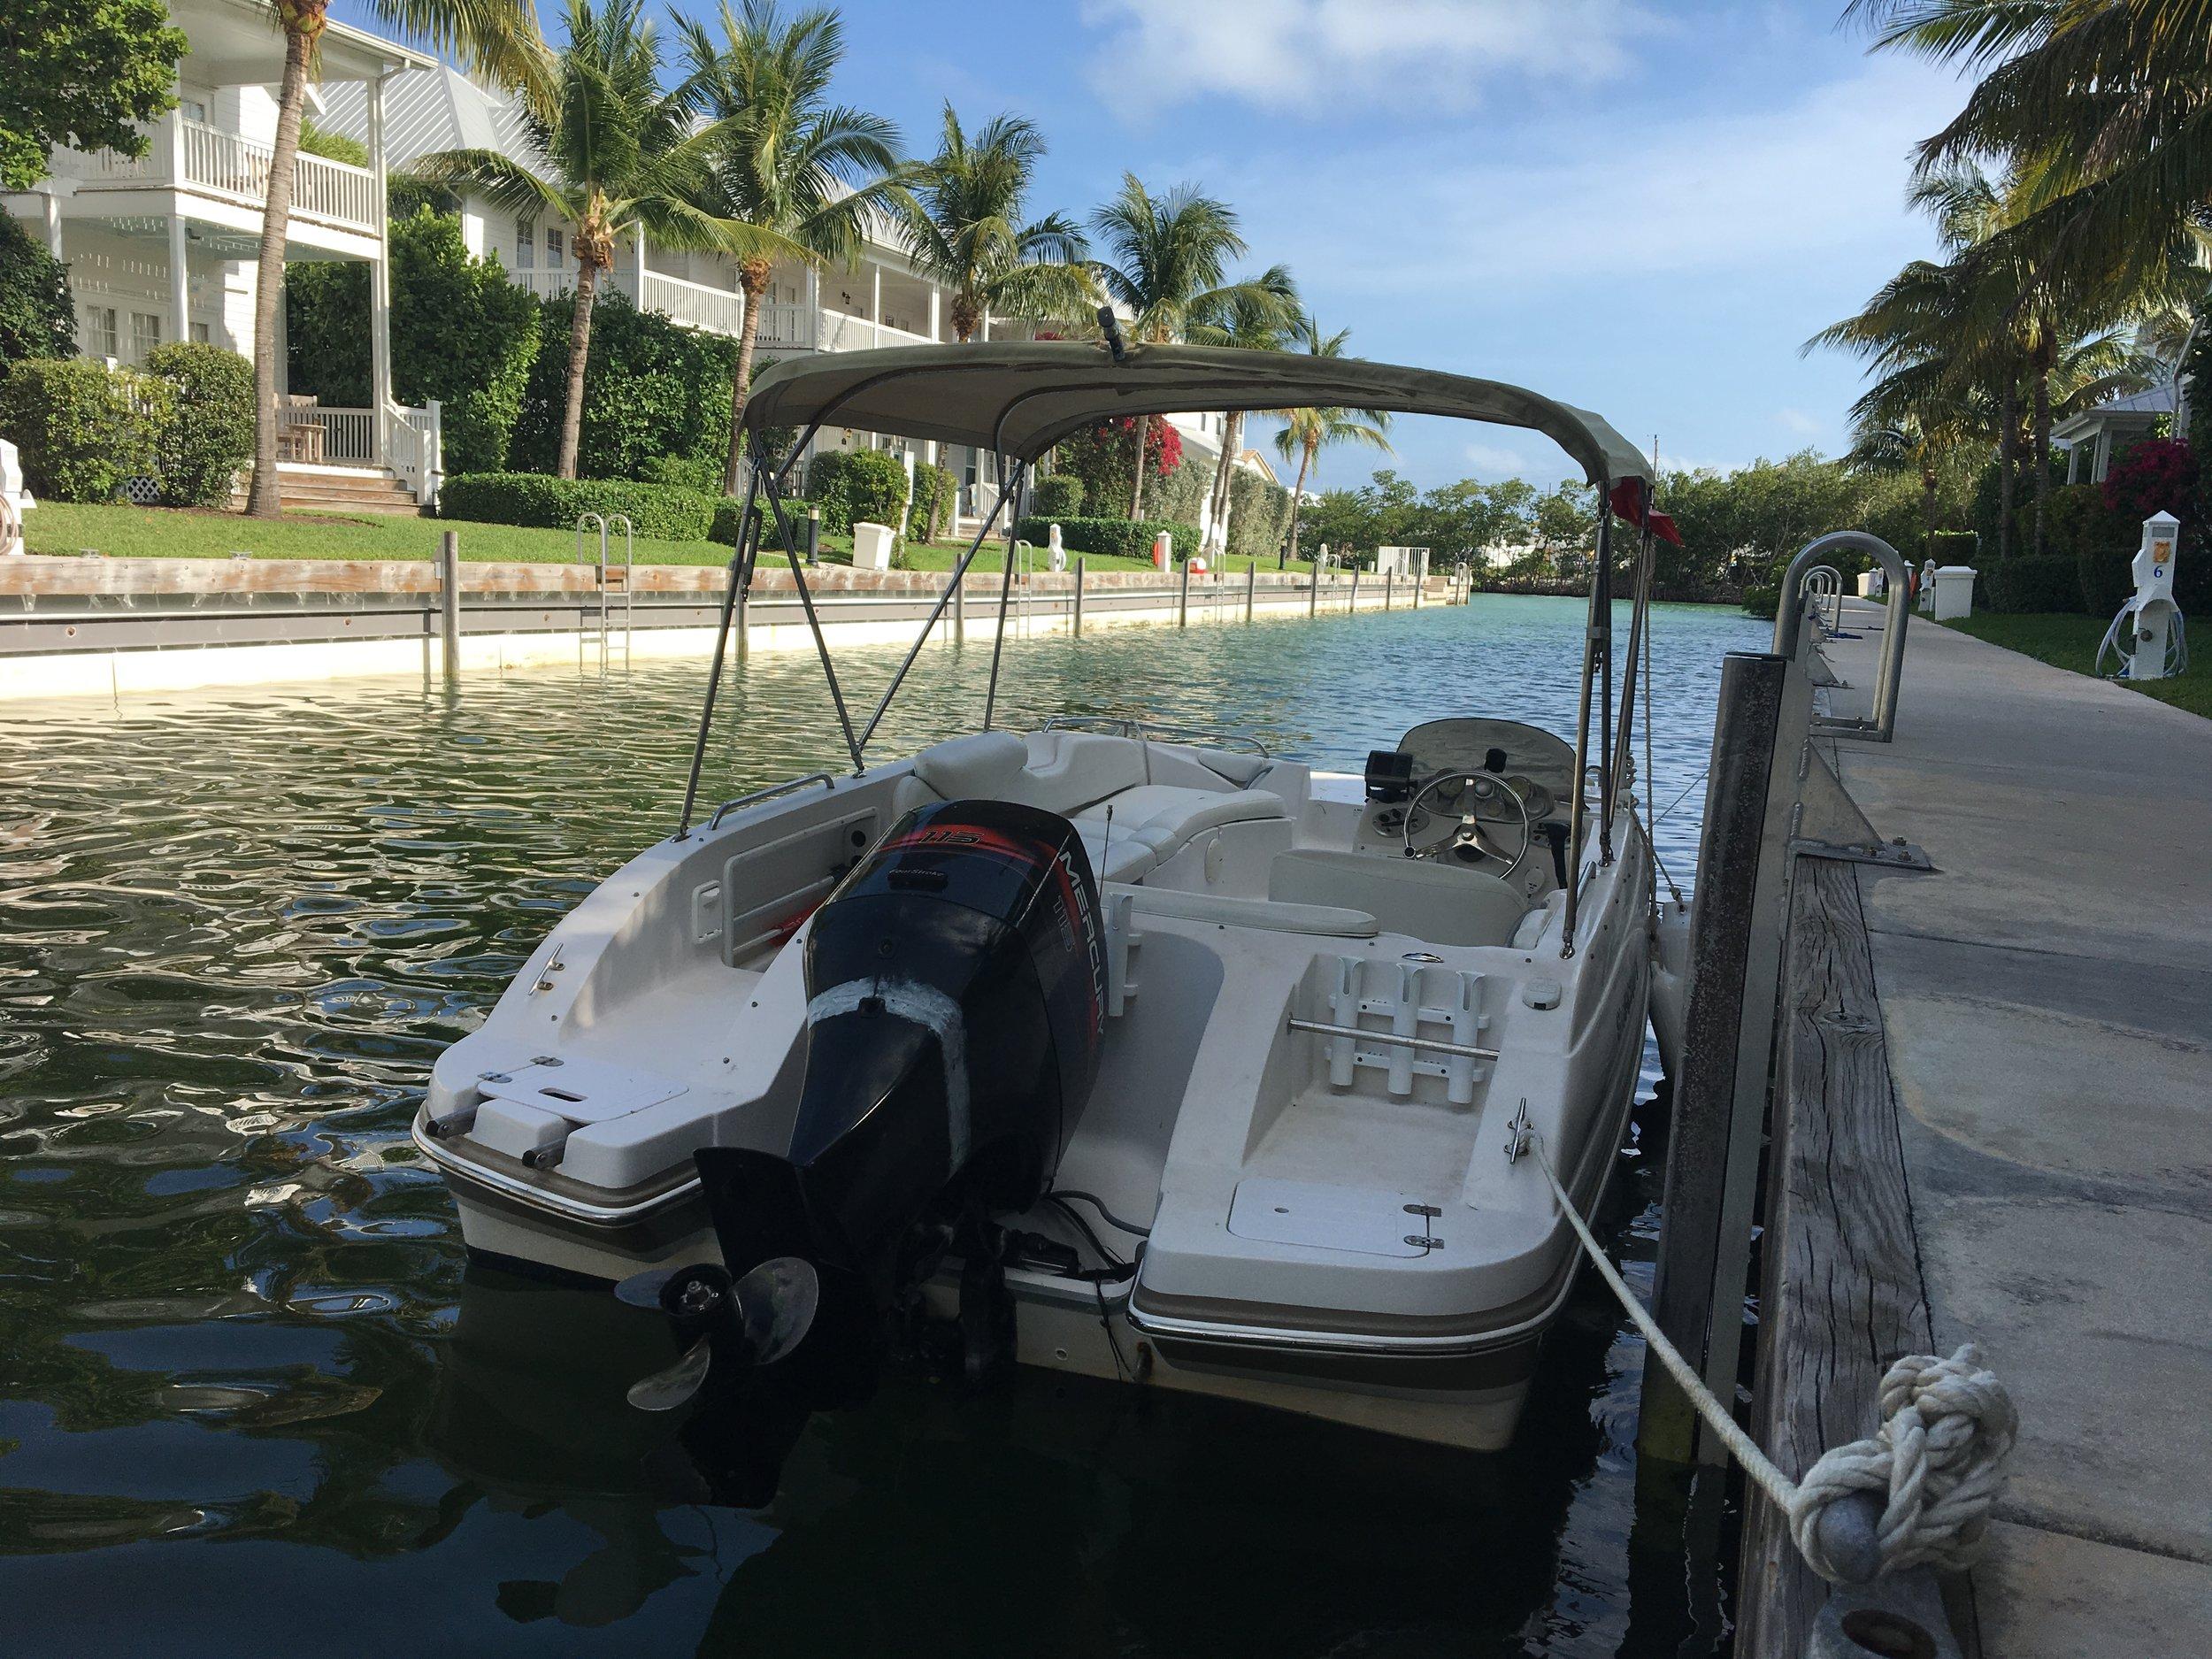 coral-lagoon-resort-canal-marathon-florida